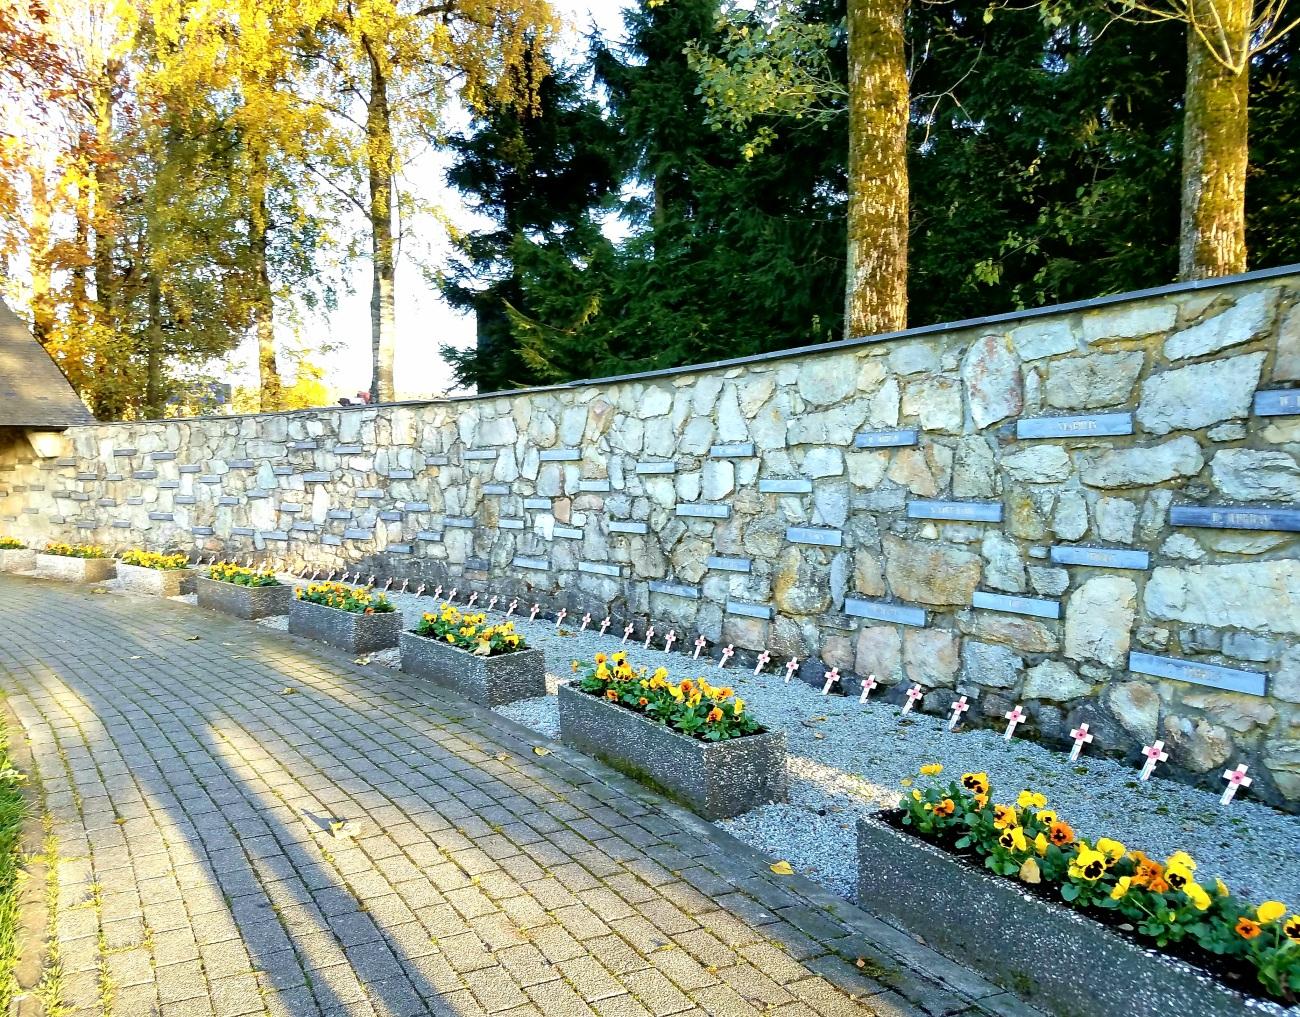 Baugnez memorial, Belgium